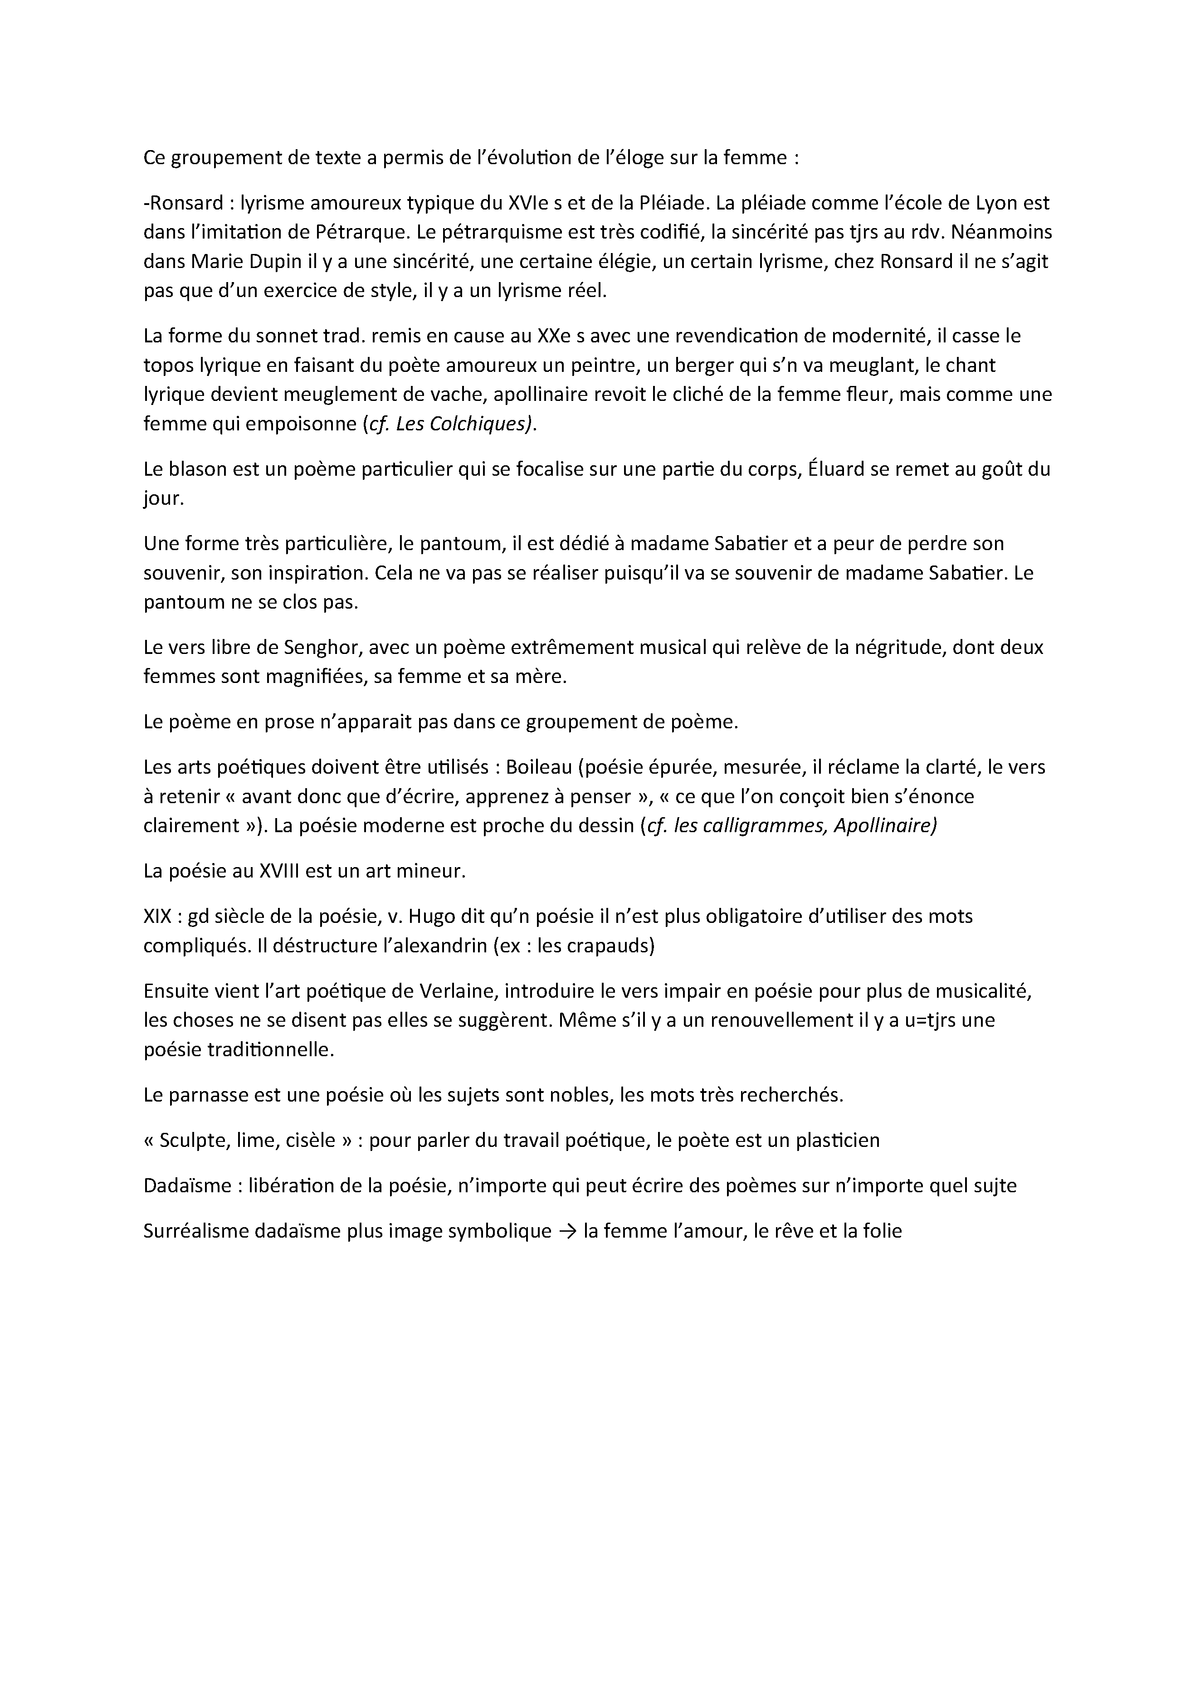 Bilan De La Poesie Français Amu Studocu